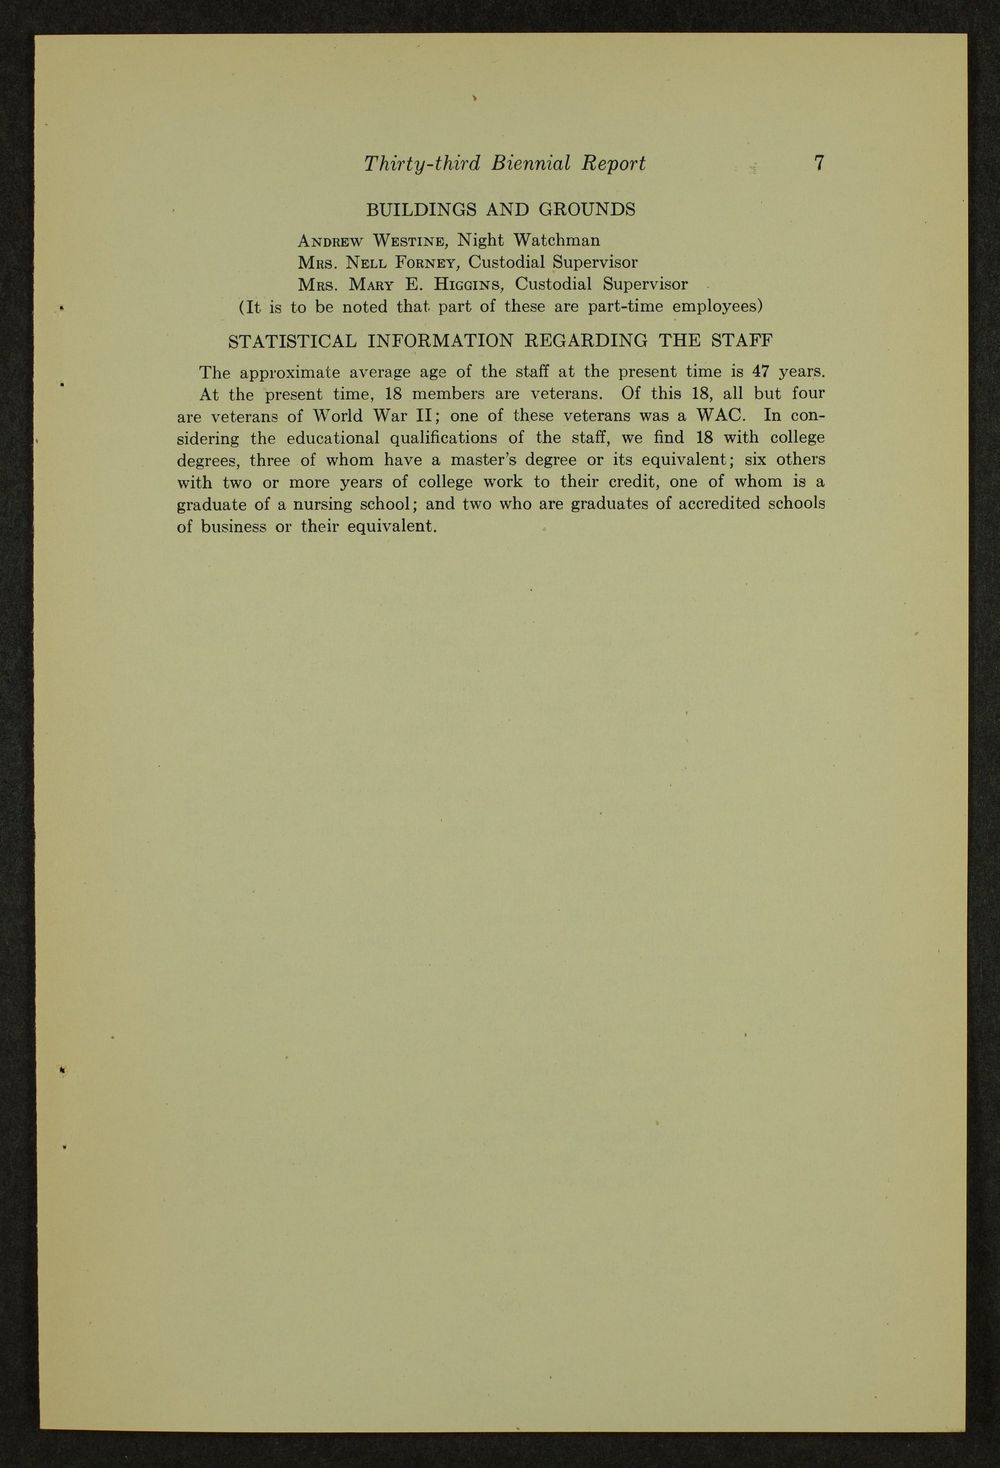 Biennial report of the Boys Industrial School, 1946 - 7